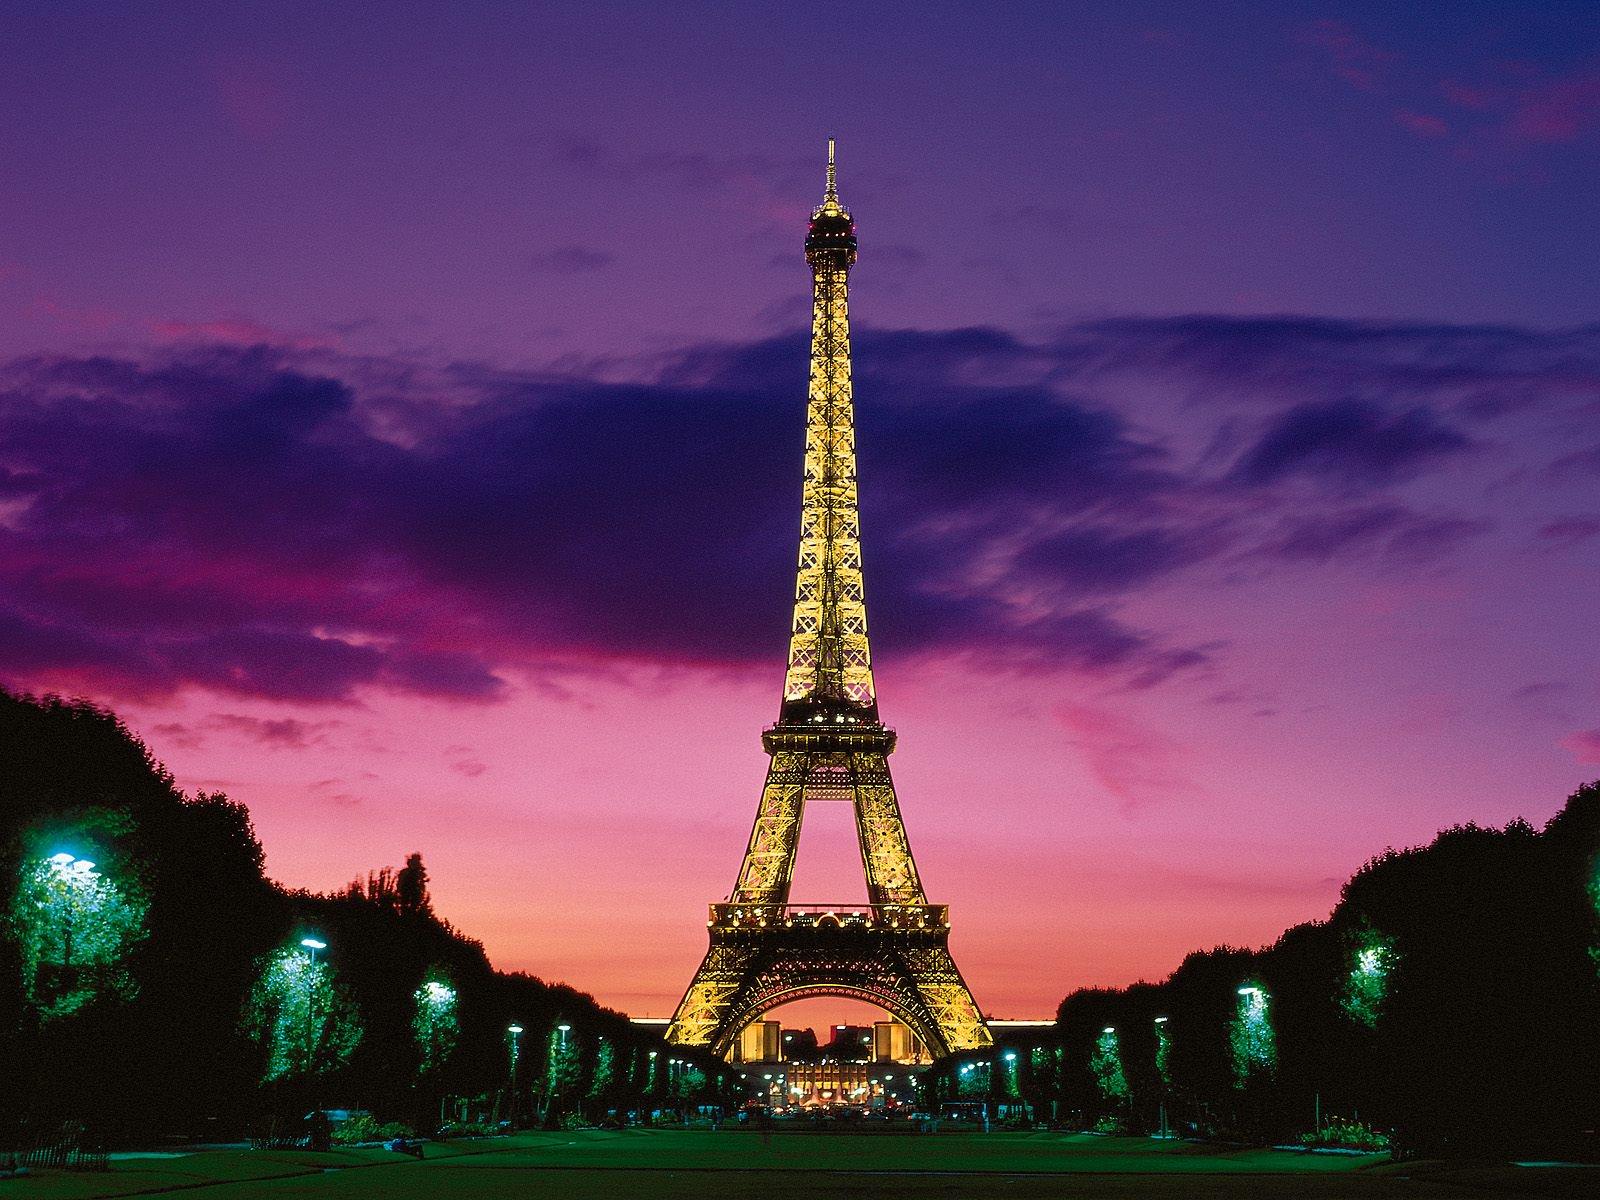 بالصور صور لبرج ايفل , اجمل صور لبرح ايفل بفرنسا 3314 24